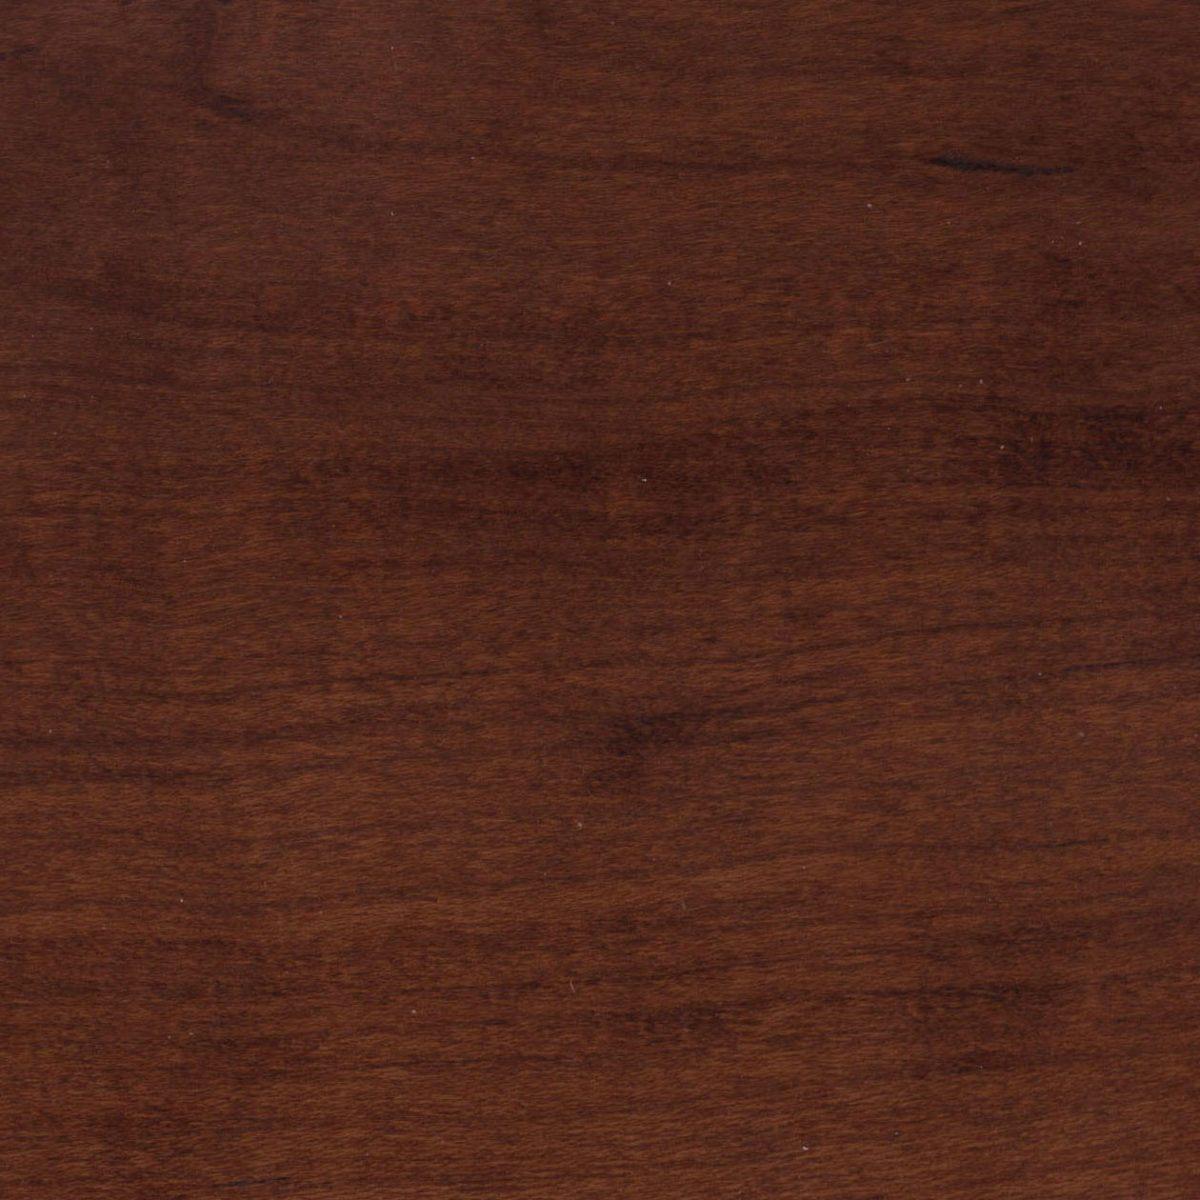 65A Cherry Wood Sample